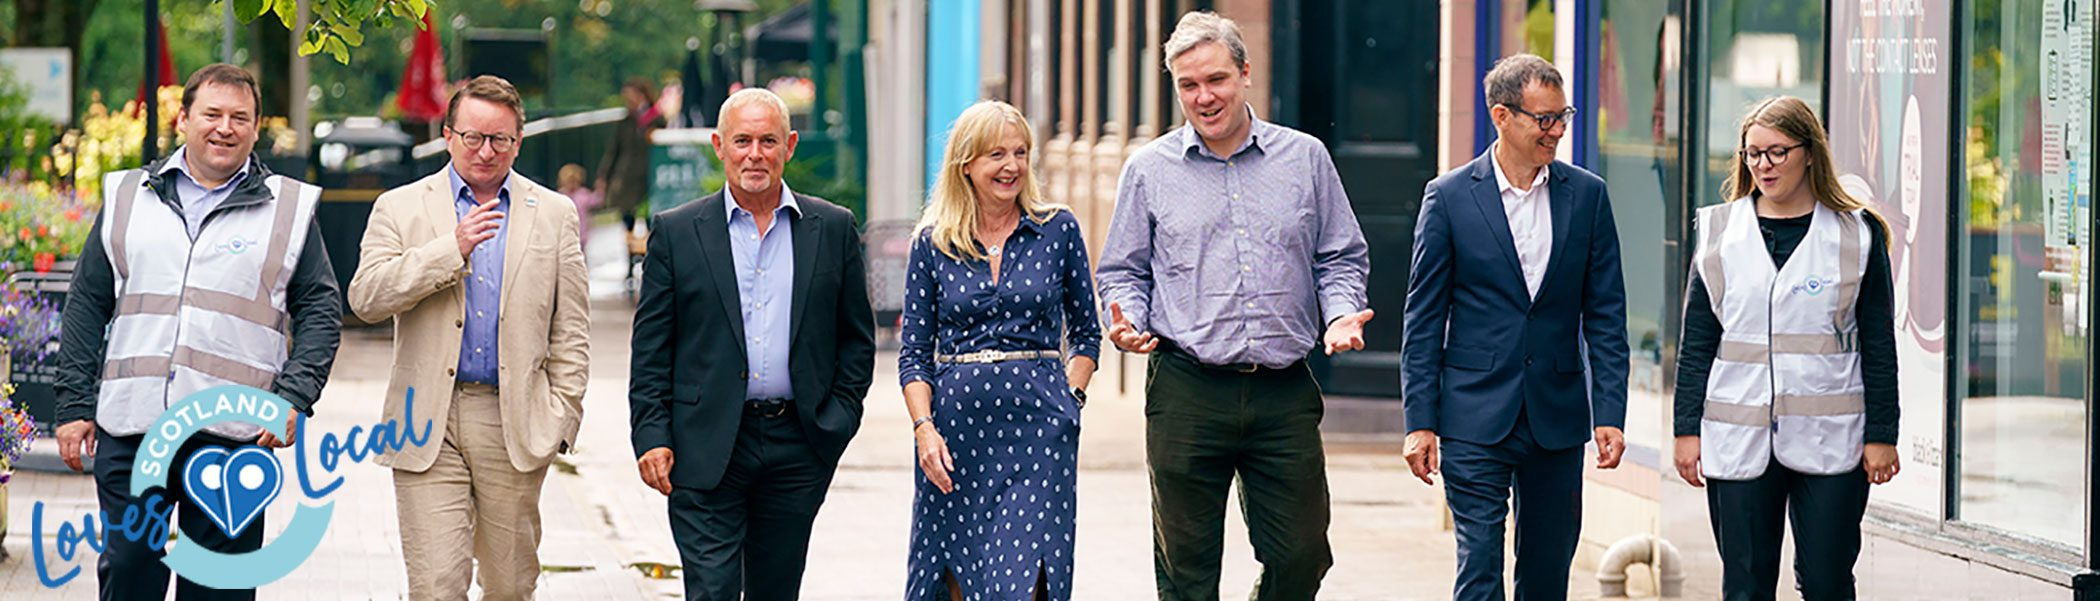 Scotland Loves Local fund Launch Milngavie August 2021